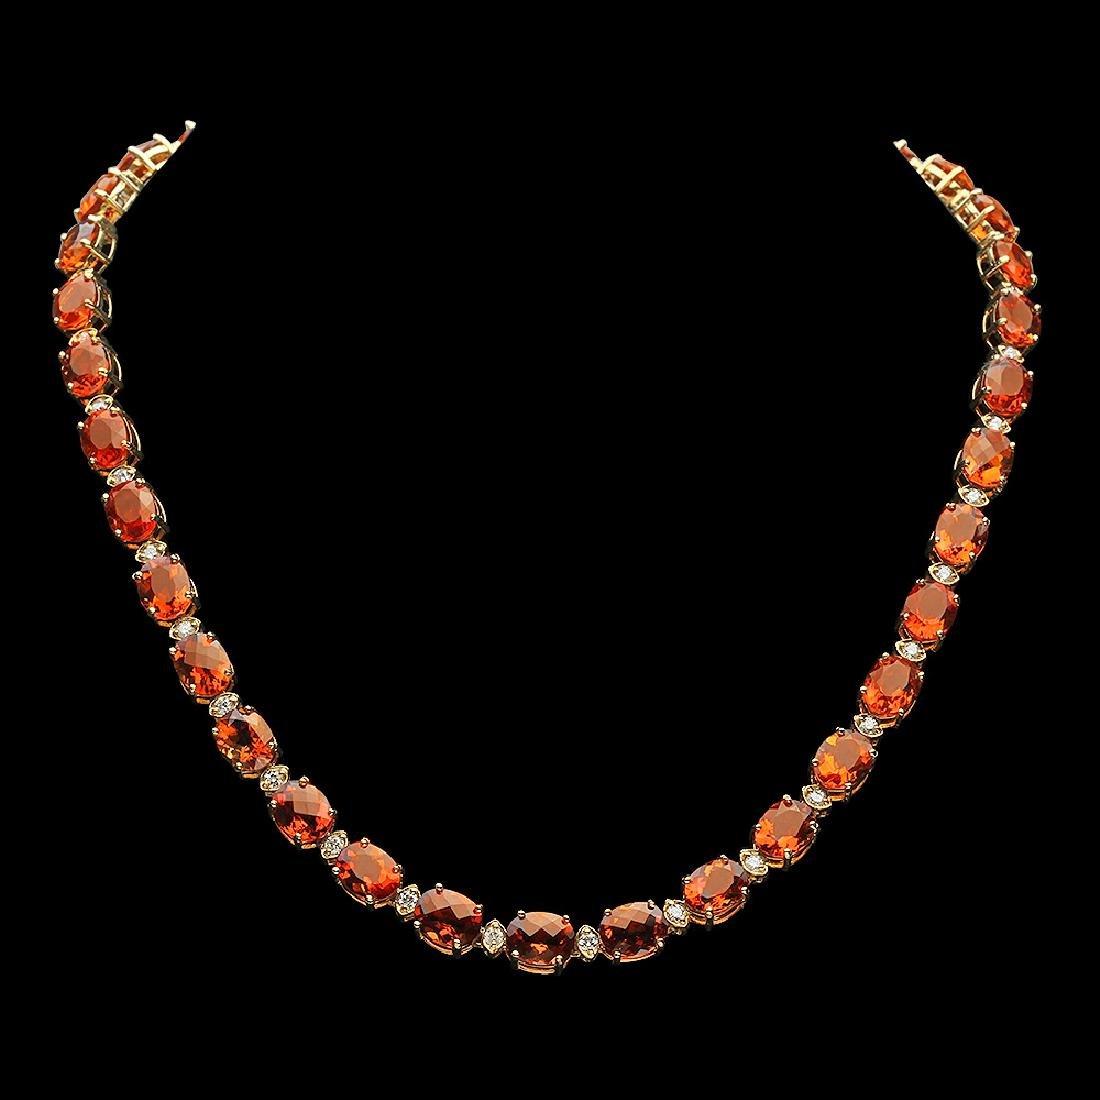 14K Gold 60.15ct Citrine Diamond Necklace